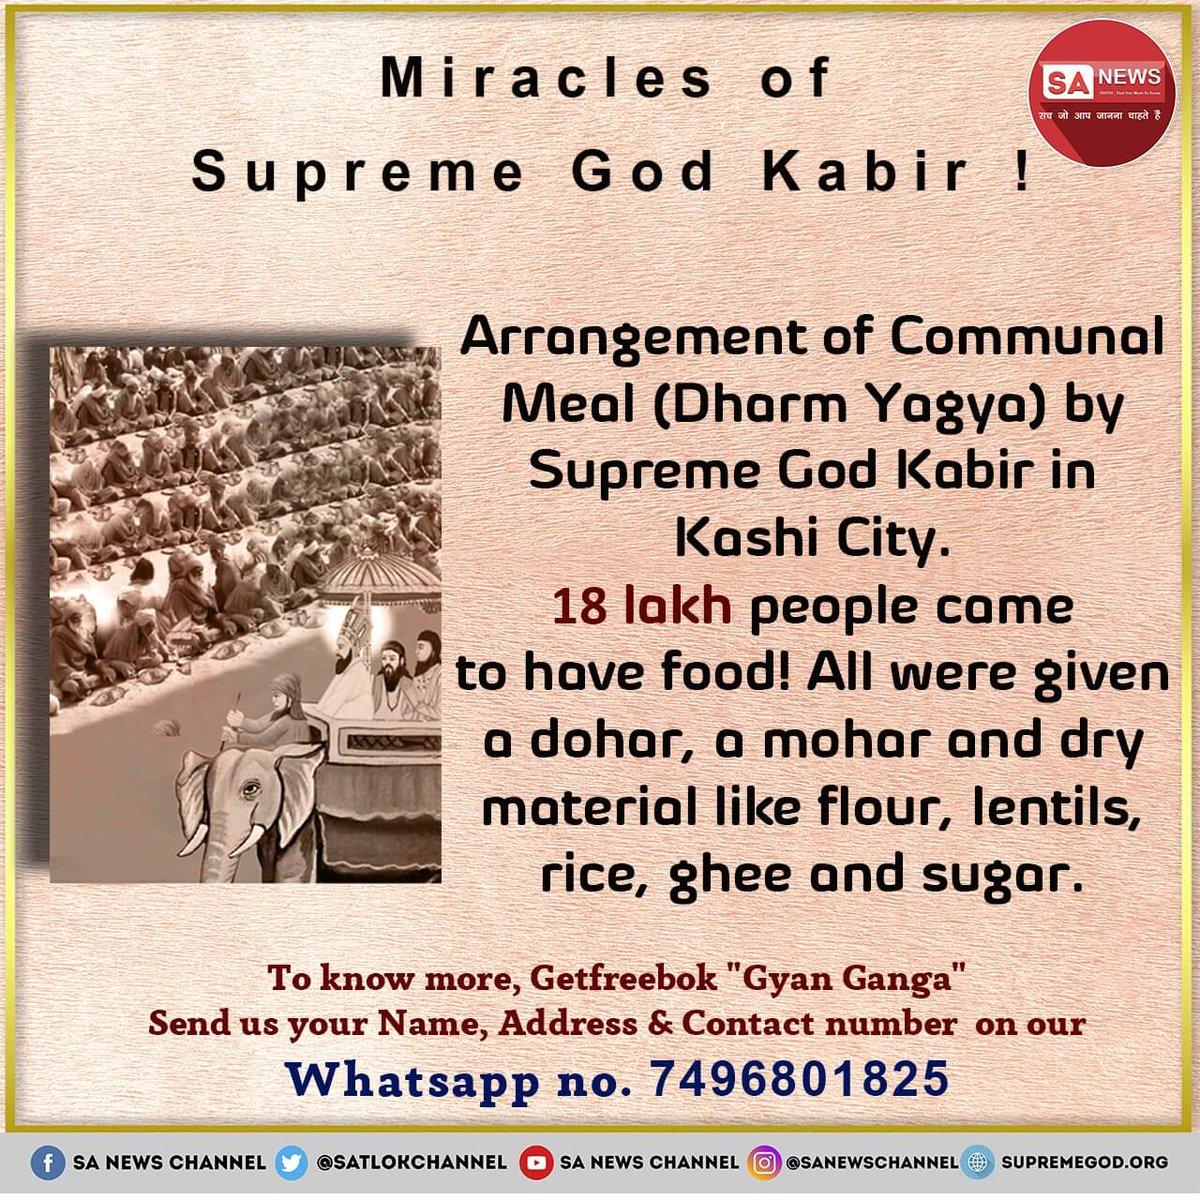 #SundayThoughts Kabir Saheb Ji tells in search of that liberation Brahma, Sur-Narmuni and deities got tired, to attain that serve Satguru  - @SaintRampalJiM  #GodMorningSunday  #SundayMotivation  #SundayFunday 🗝️🗝️❤️❤️ https://t.co/XGFI5nYTvm